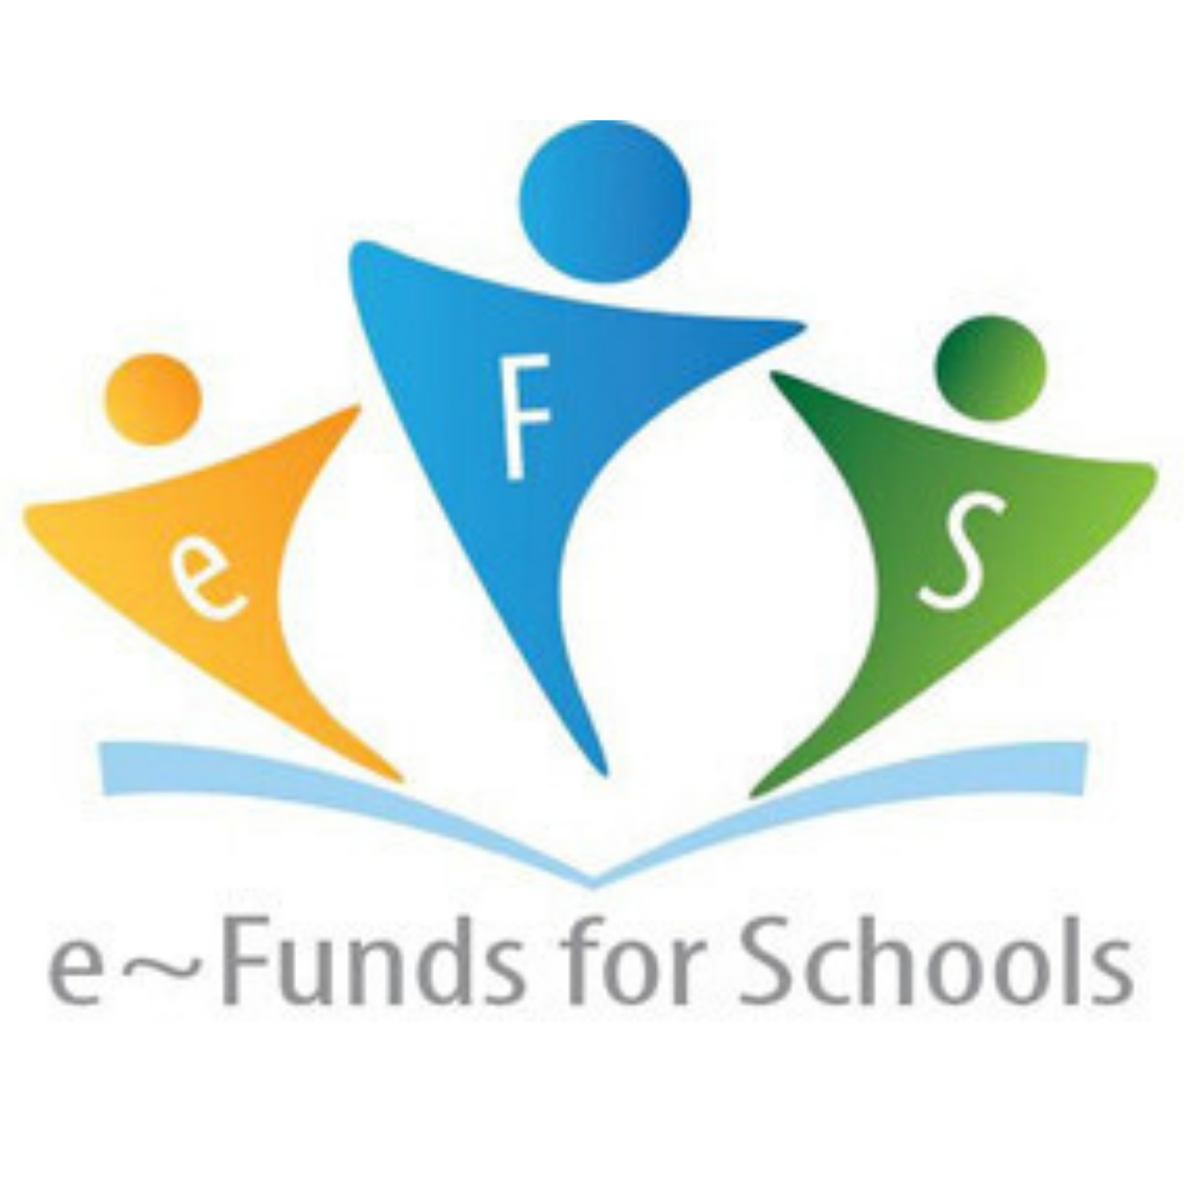 eFunds